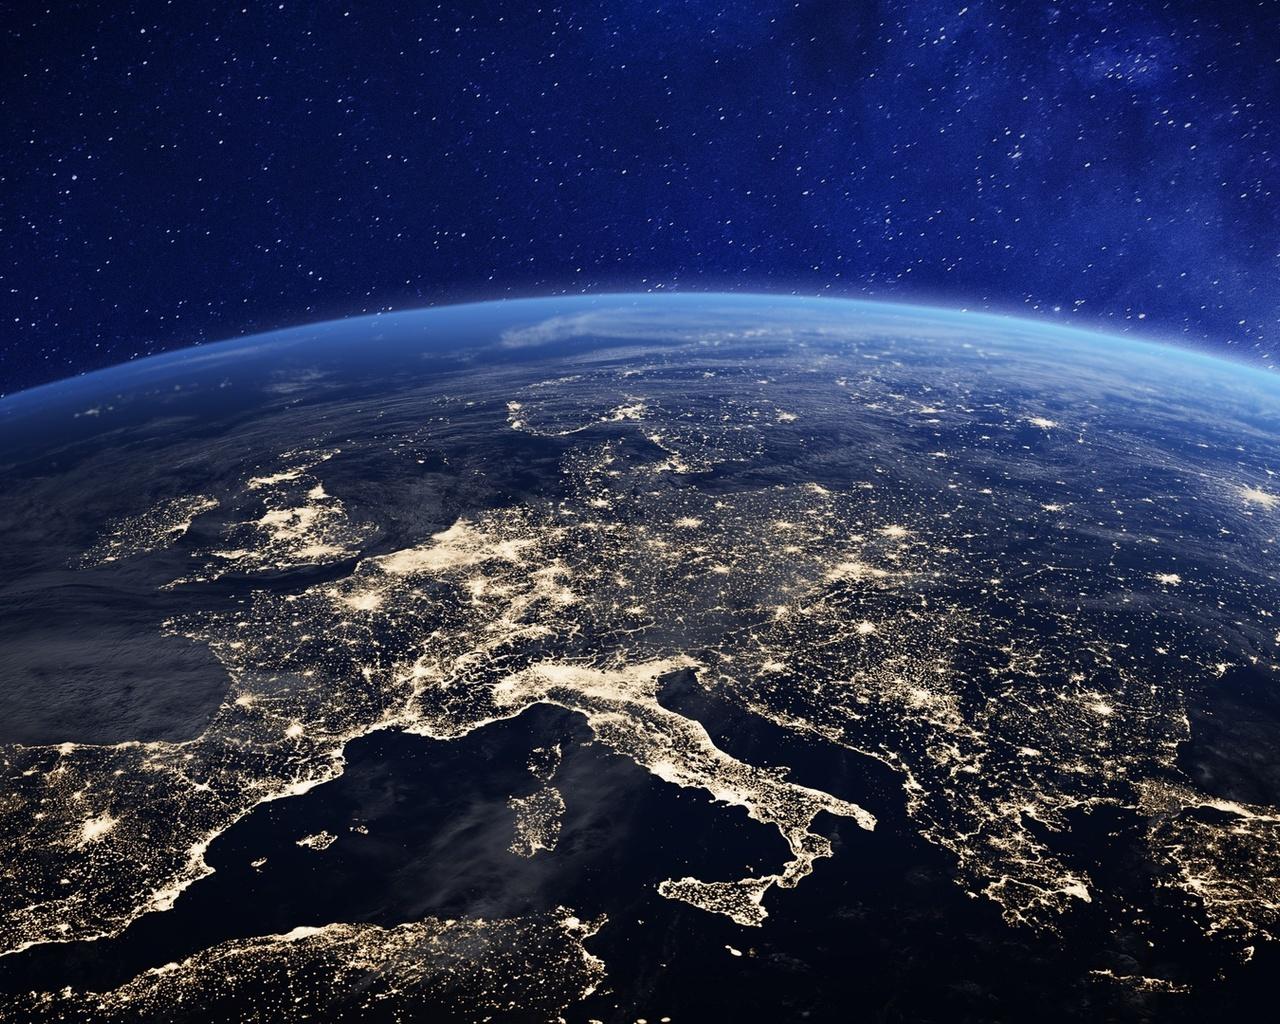 европа, планета, земля, космос